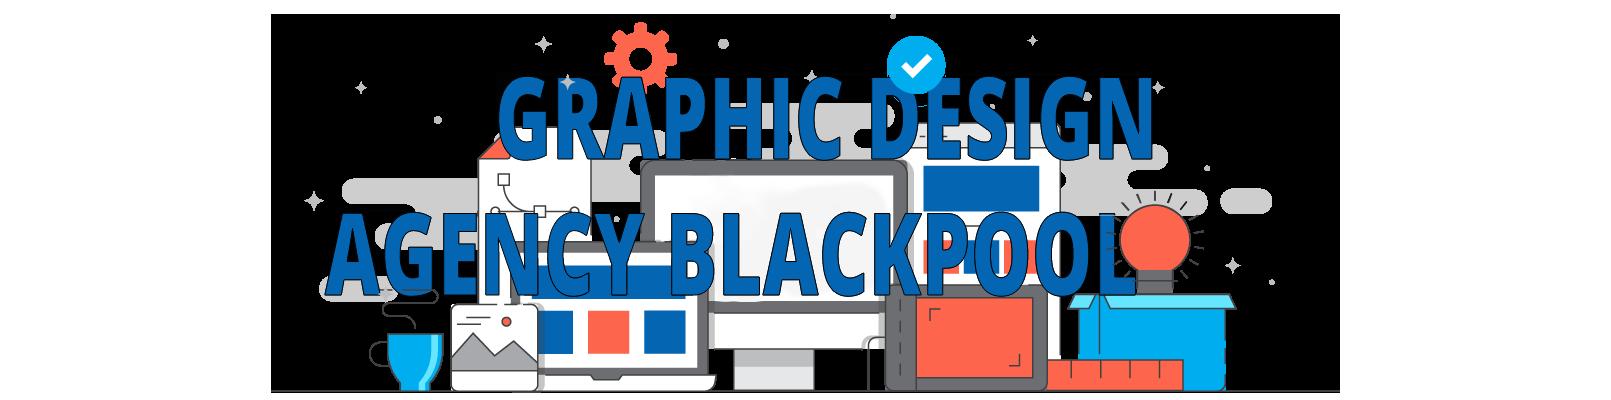 seek social graphic design agency blackpool transparent header